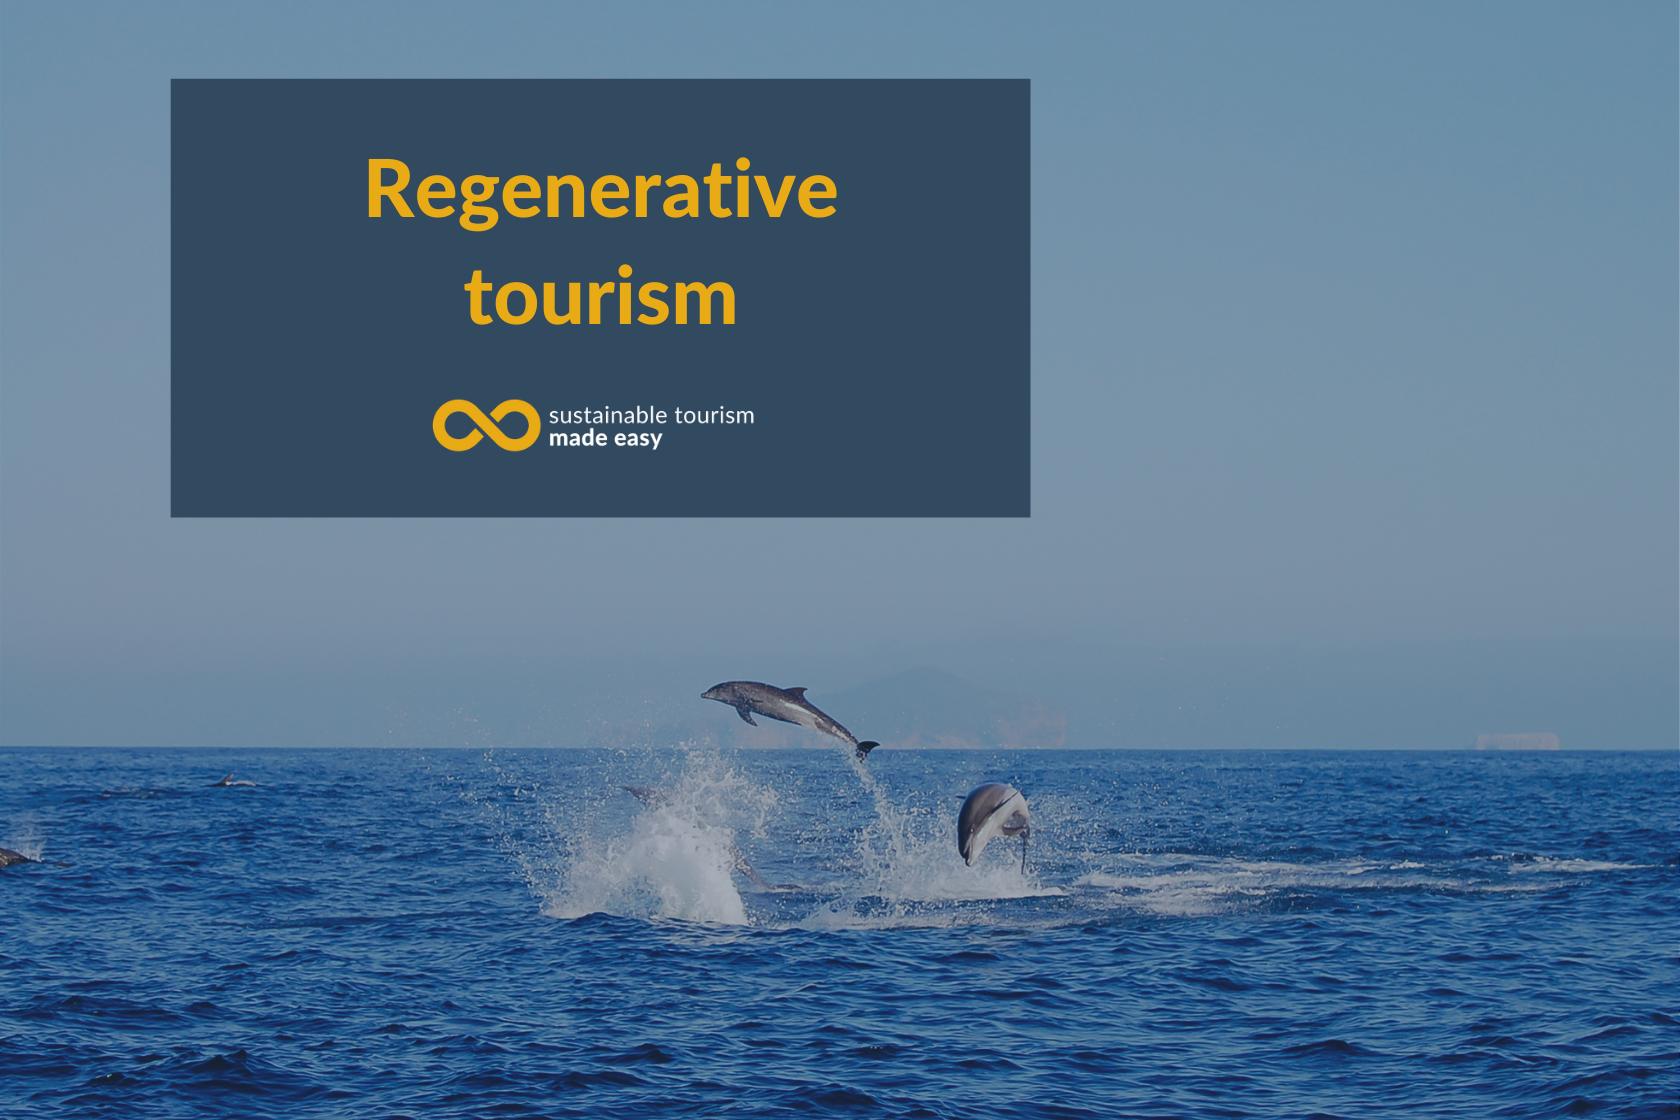 Regenerative tourism